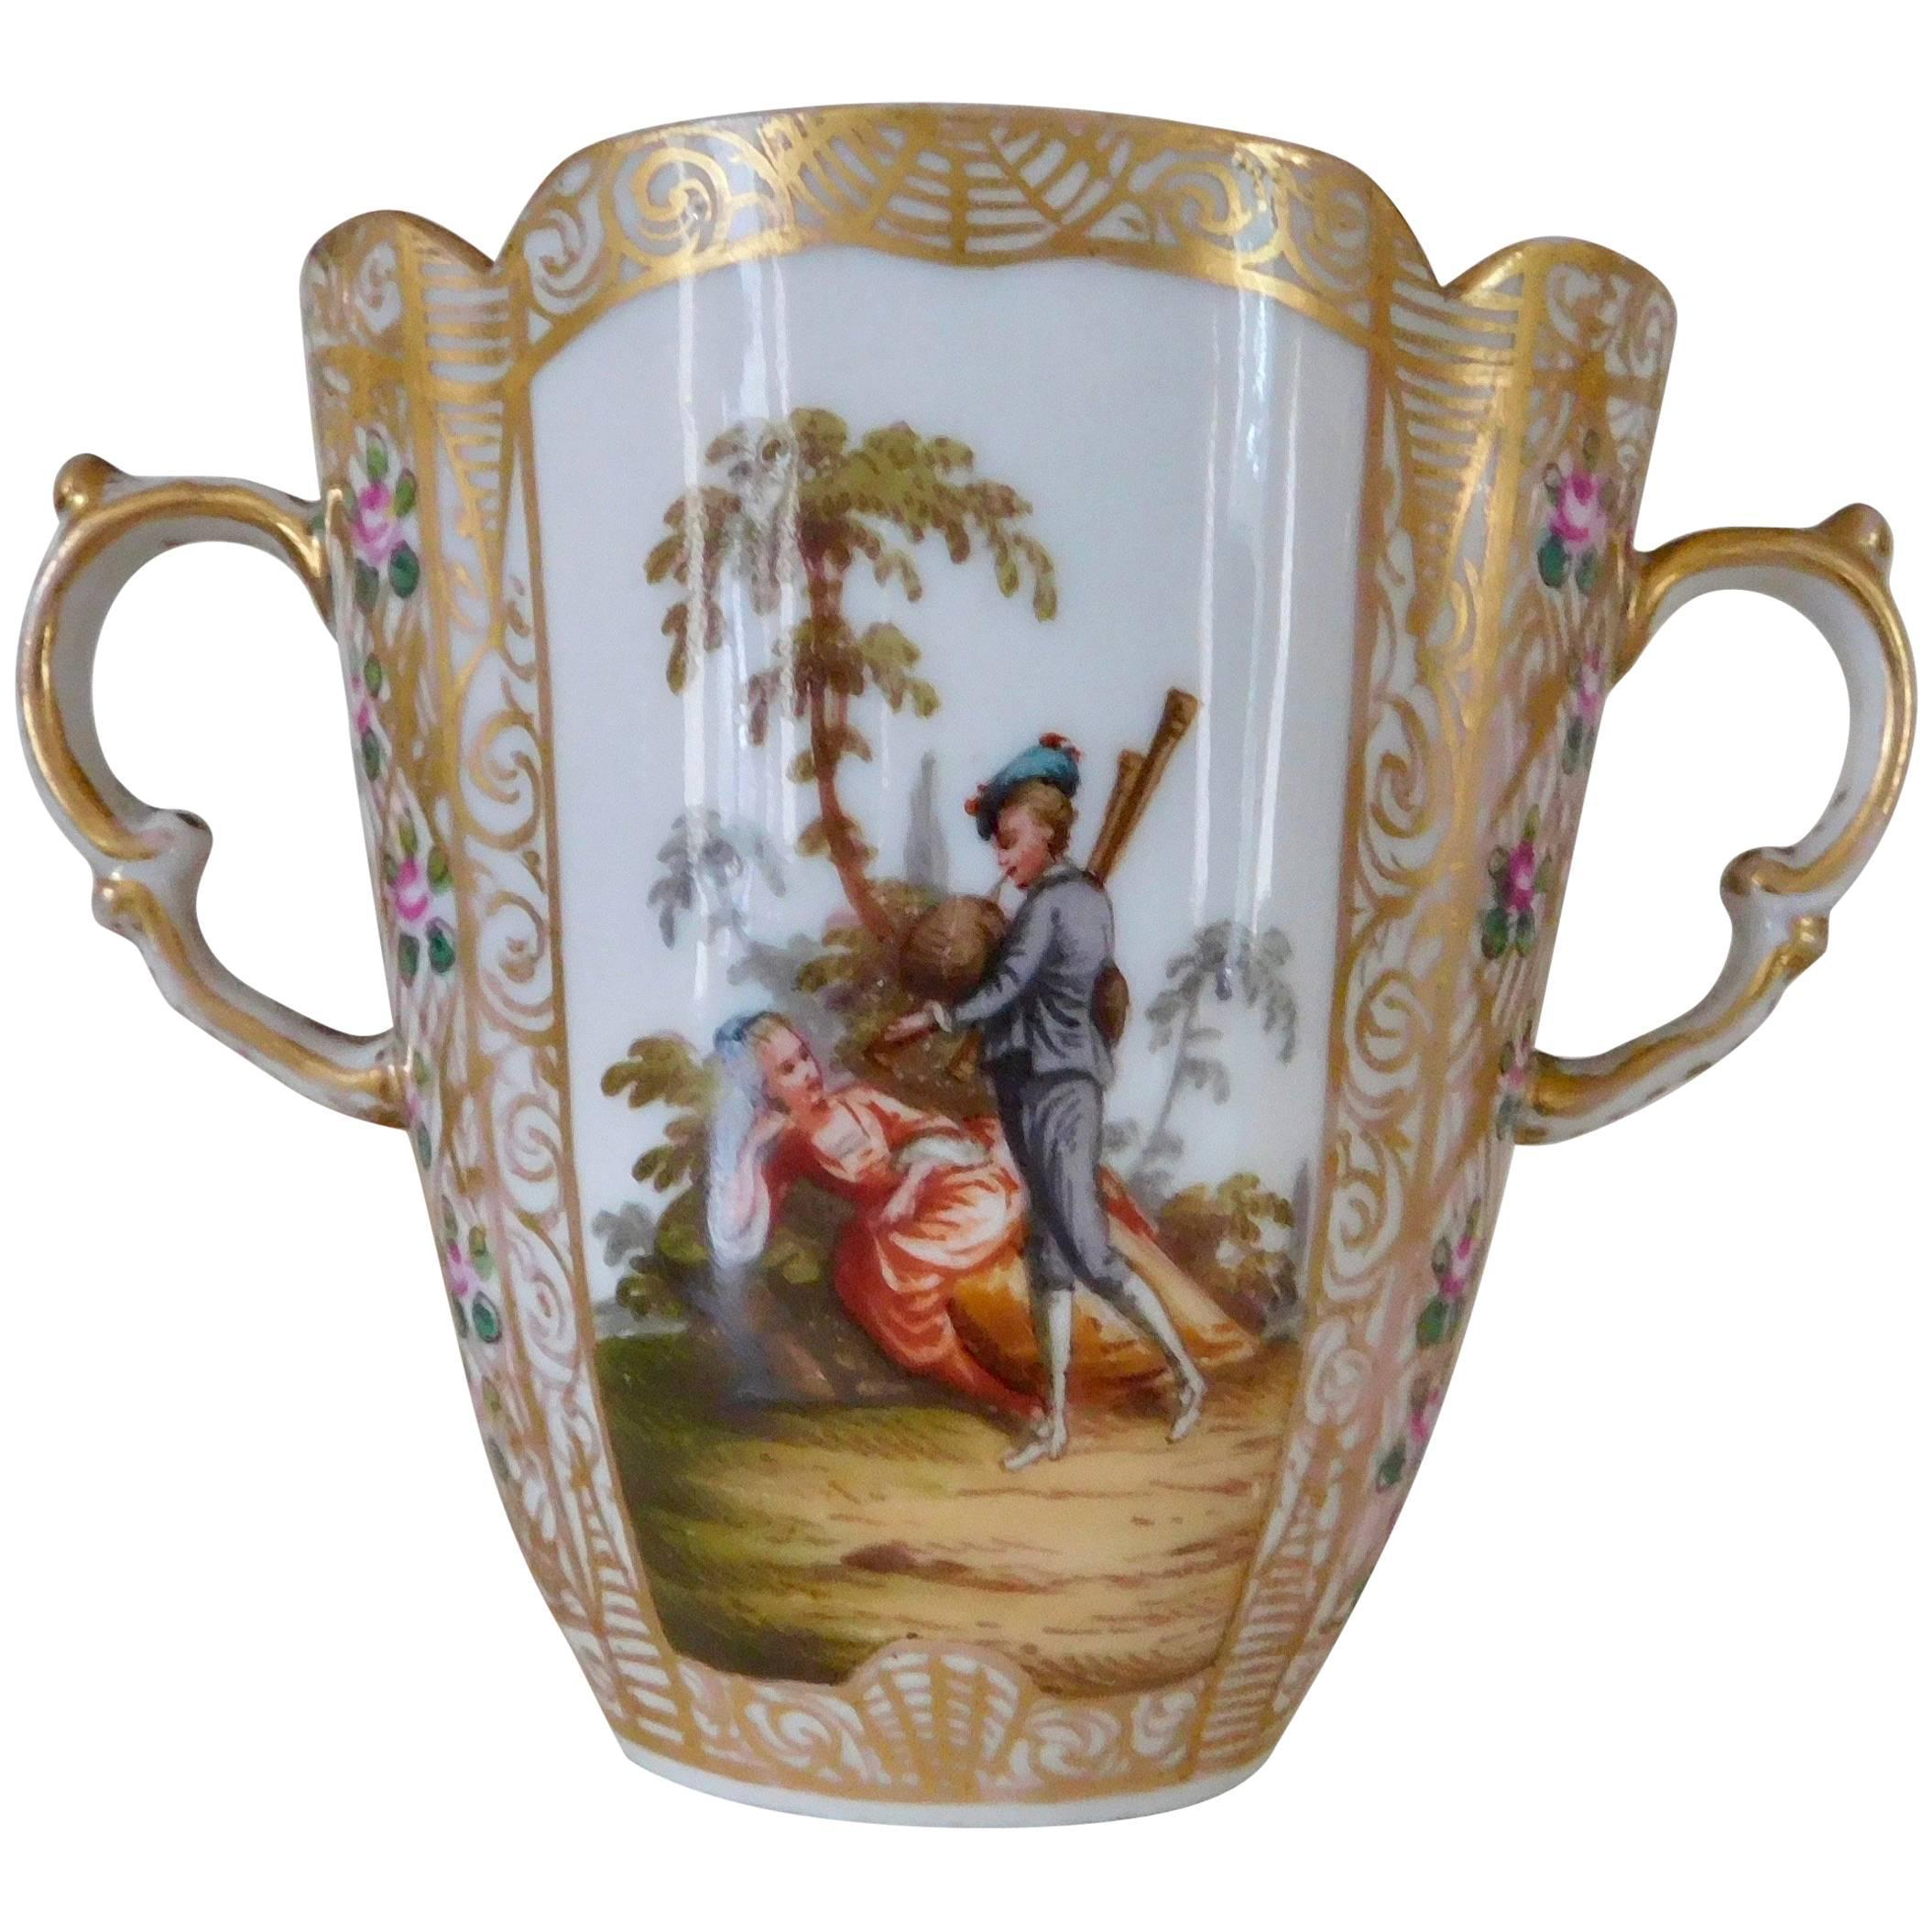 19th Century Antique Helena Wolfsohn Porcelain Cabinet Chocolate Cup, circa 1880